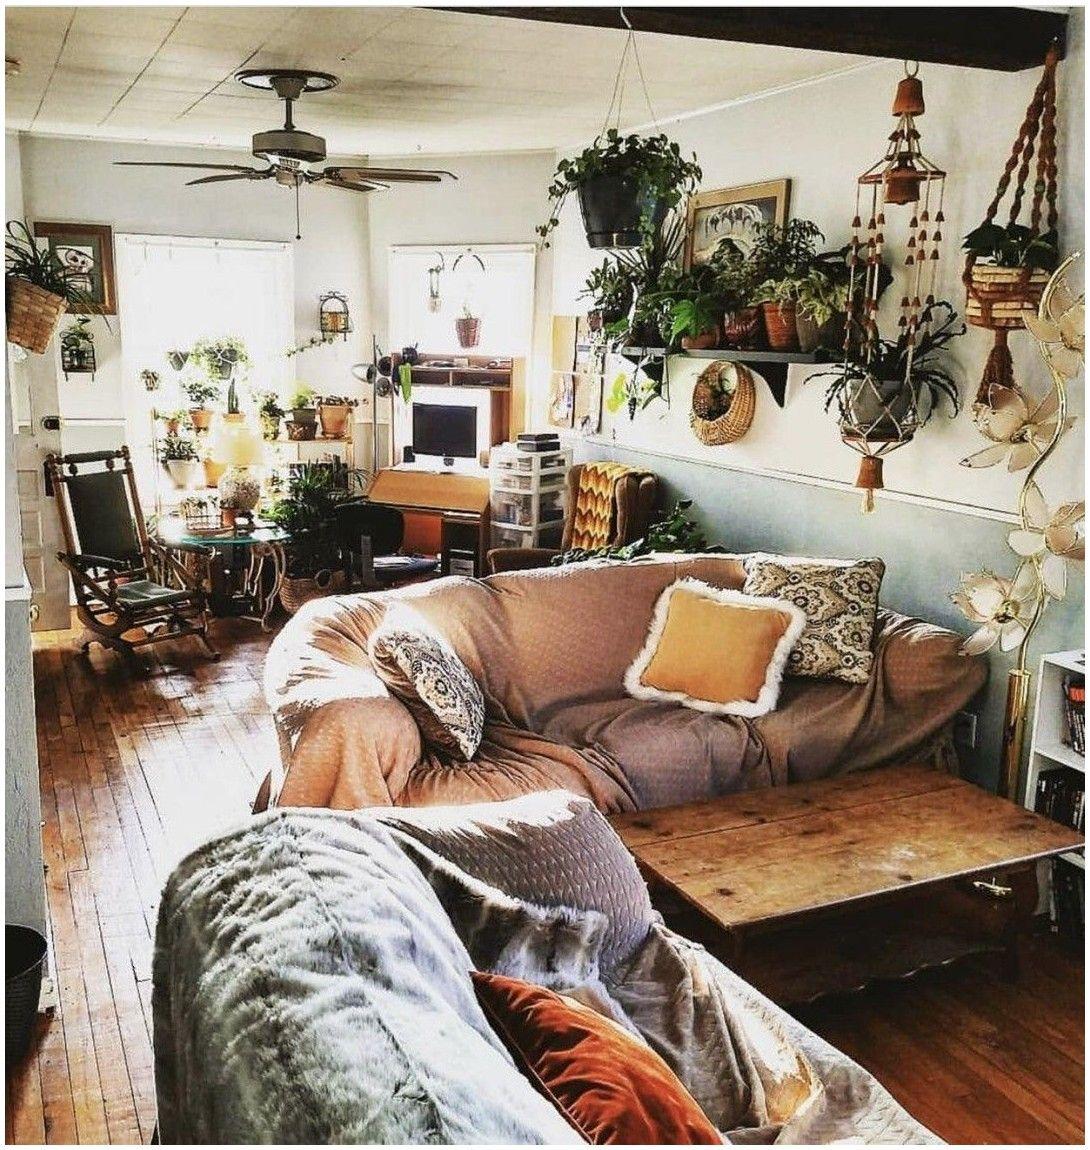 67 Reference Of Modern Sofa Reddit In 2020 Stylish Bedroom Design Home Decor Interior Design Living Room